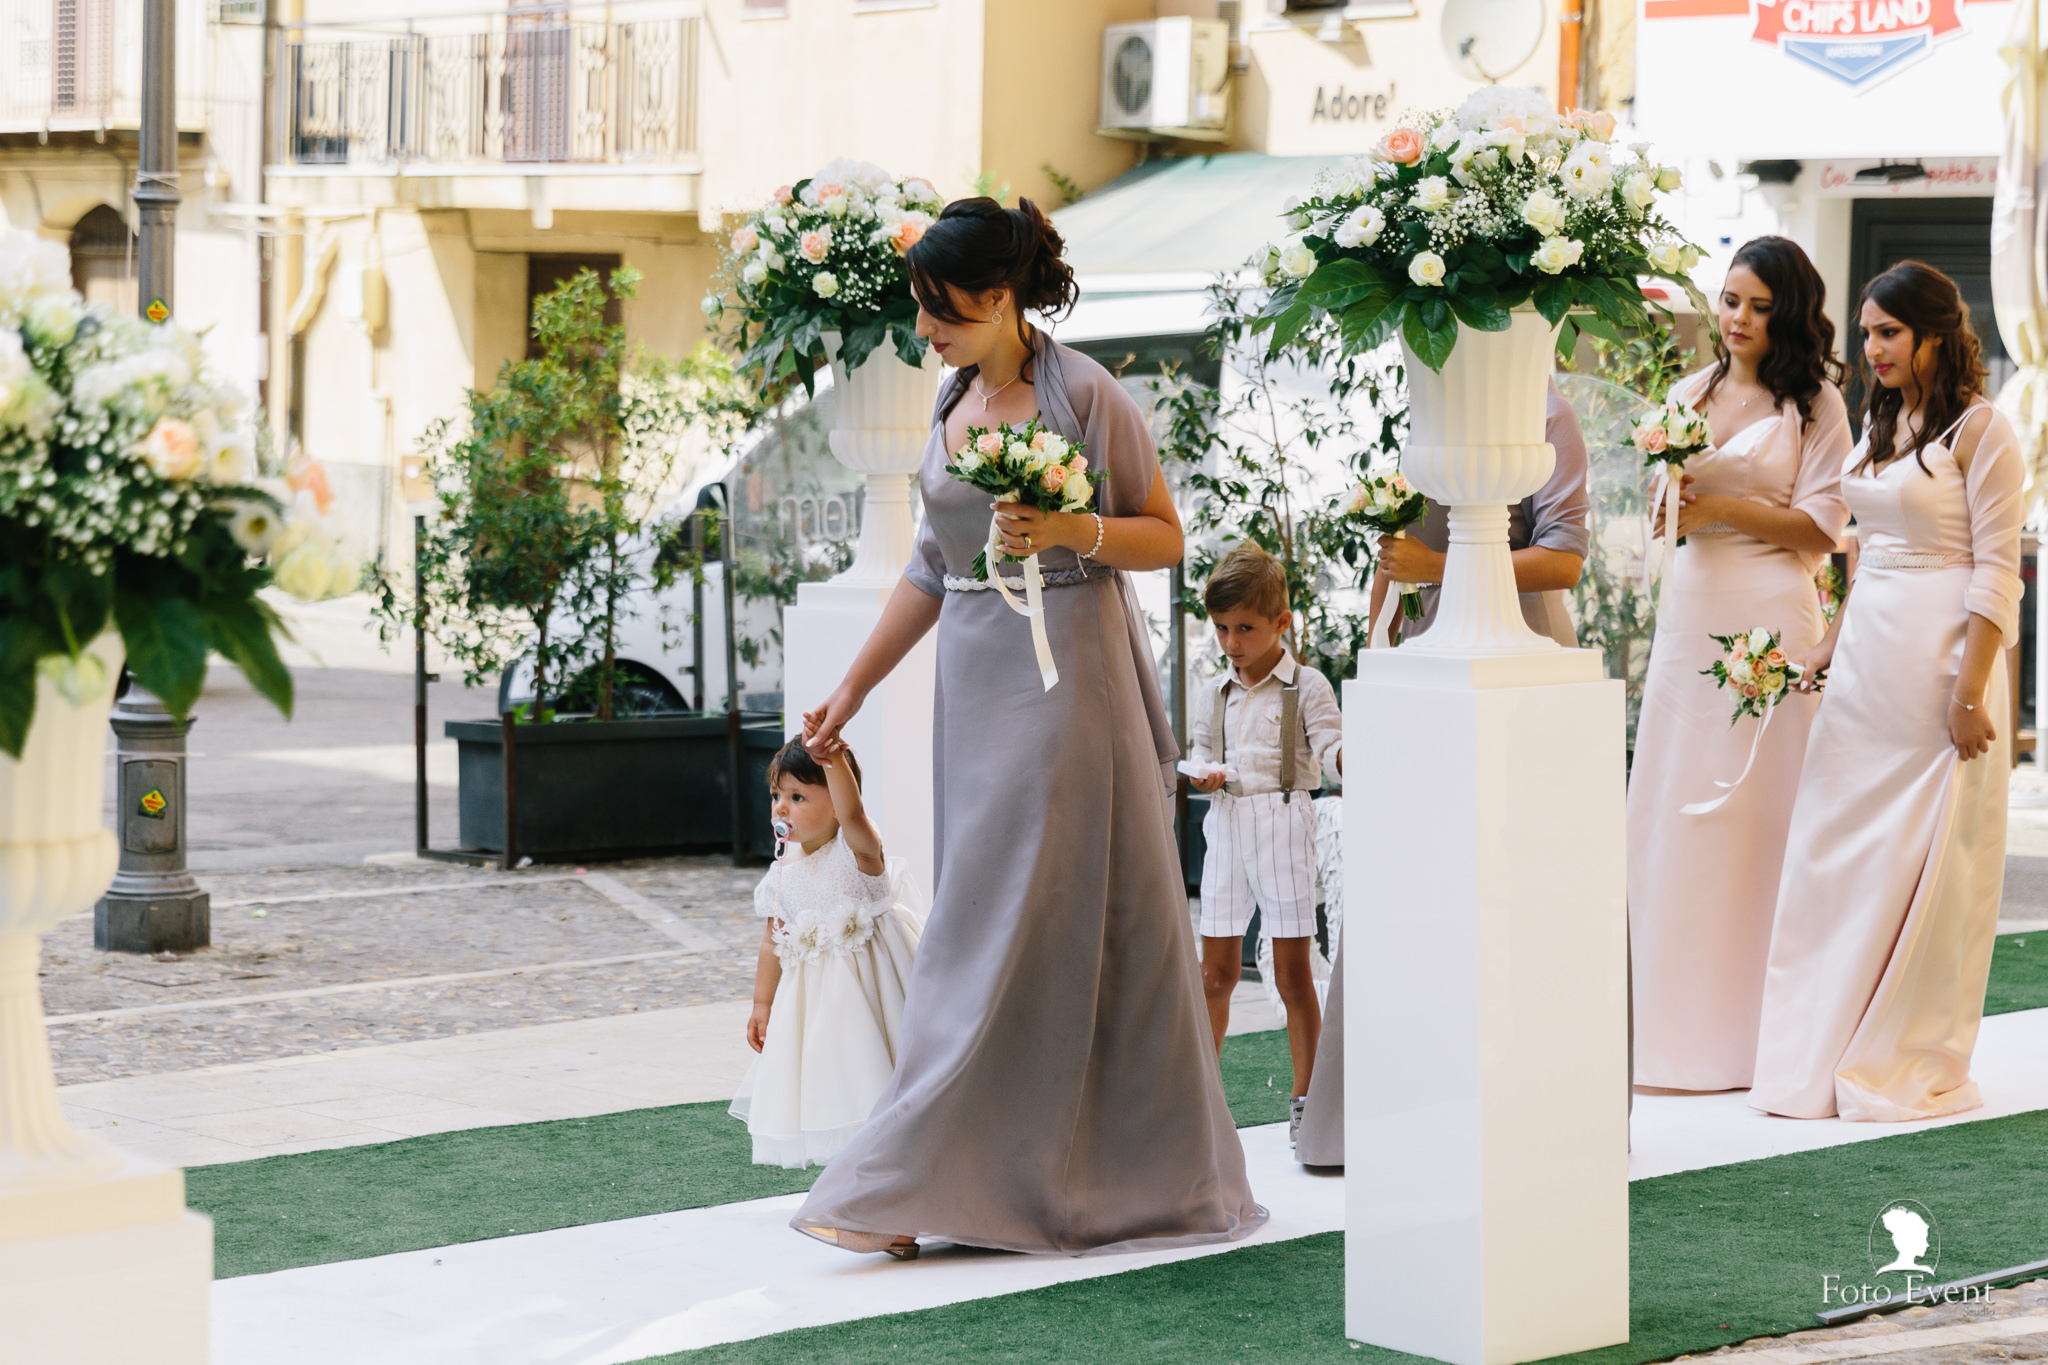 030-2019-08-31-Matrimonio-Serena-e-Saverio-Tarantino-5DE-1033